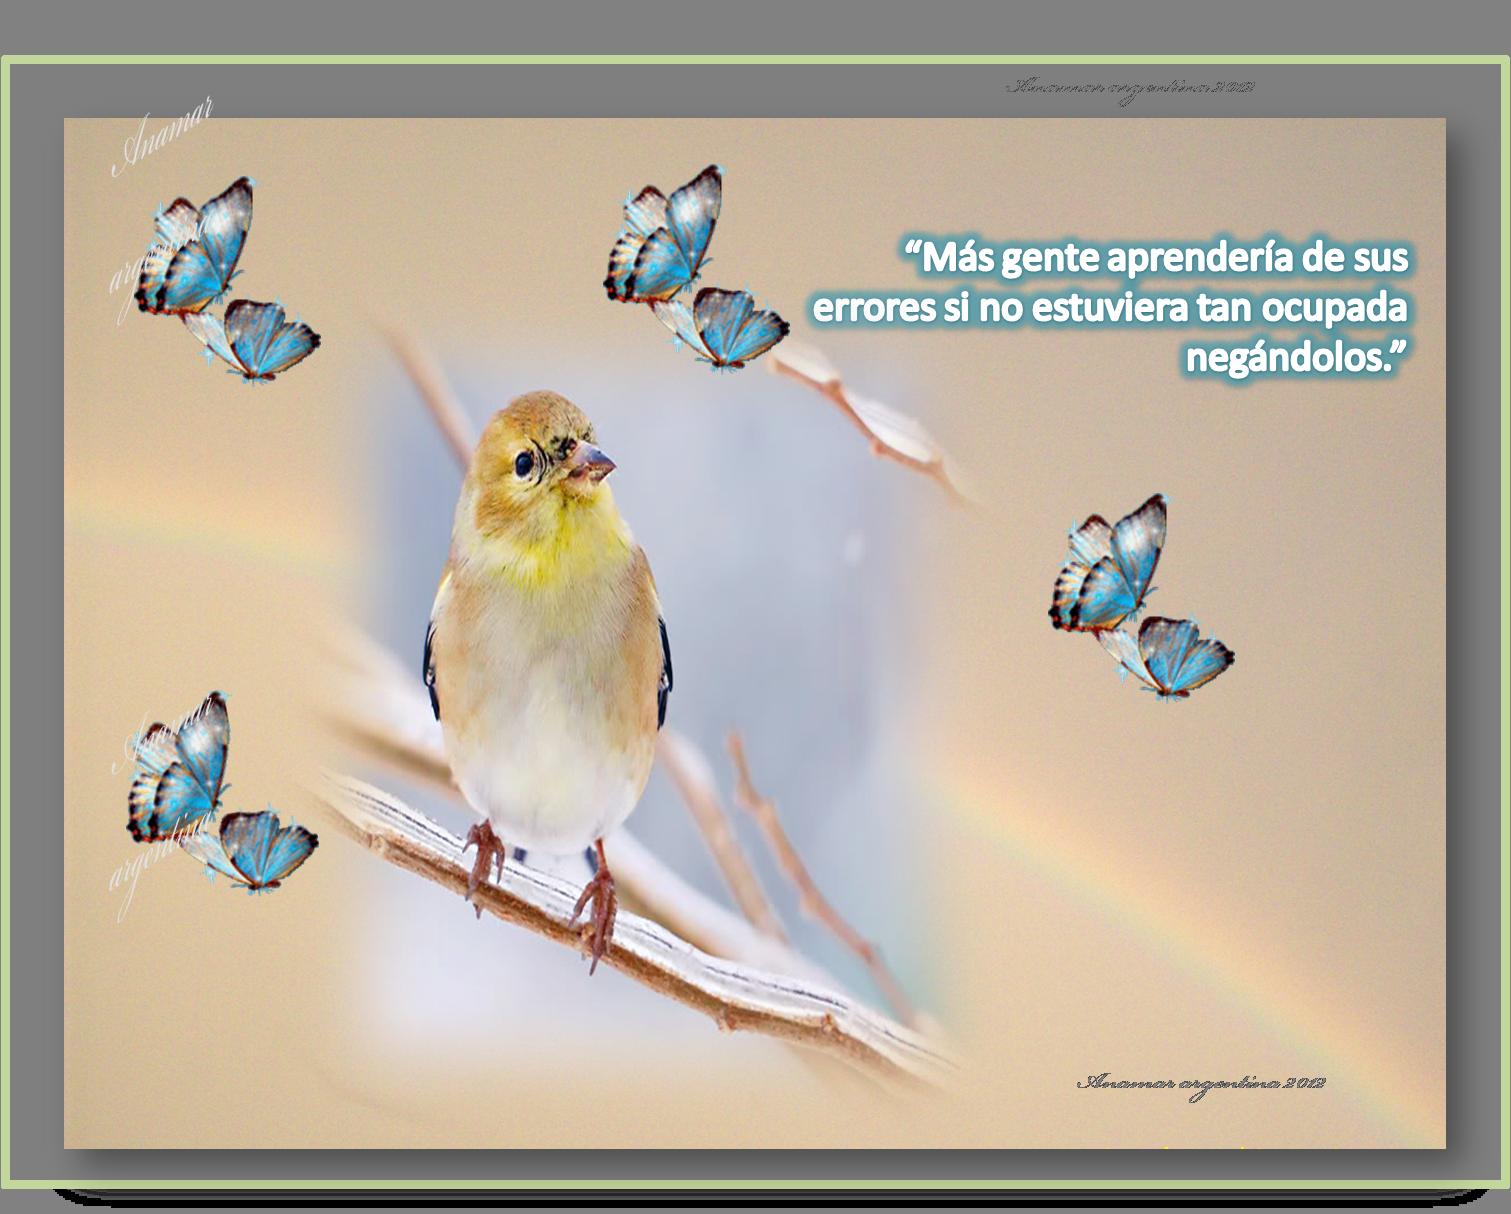 Imagens E Frases De Domingo: Feliz Domingo !! Imagenes Con Frases -anamar Argentina